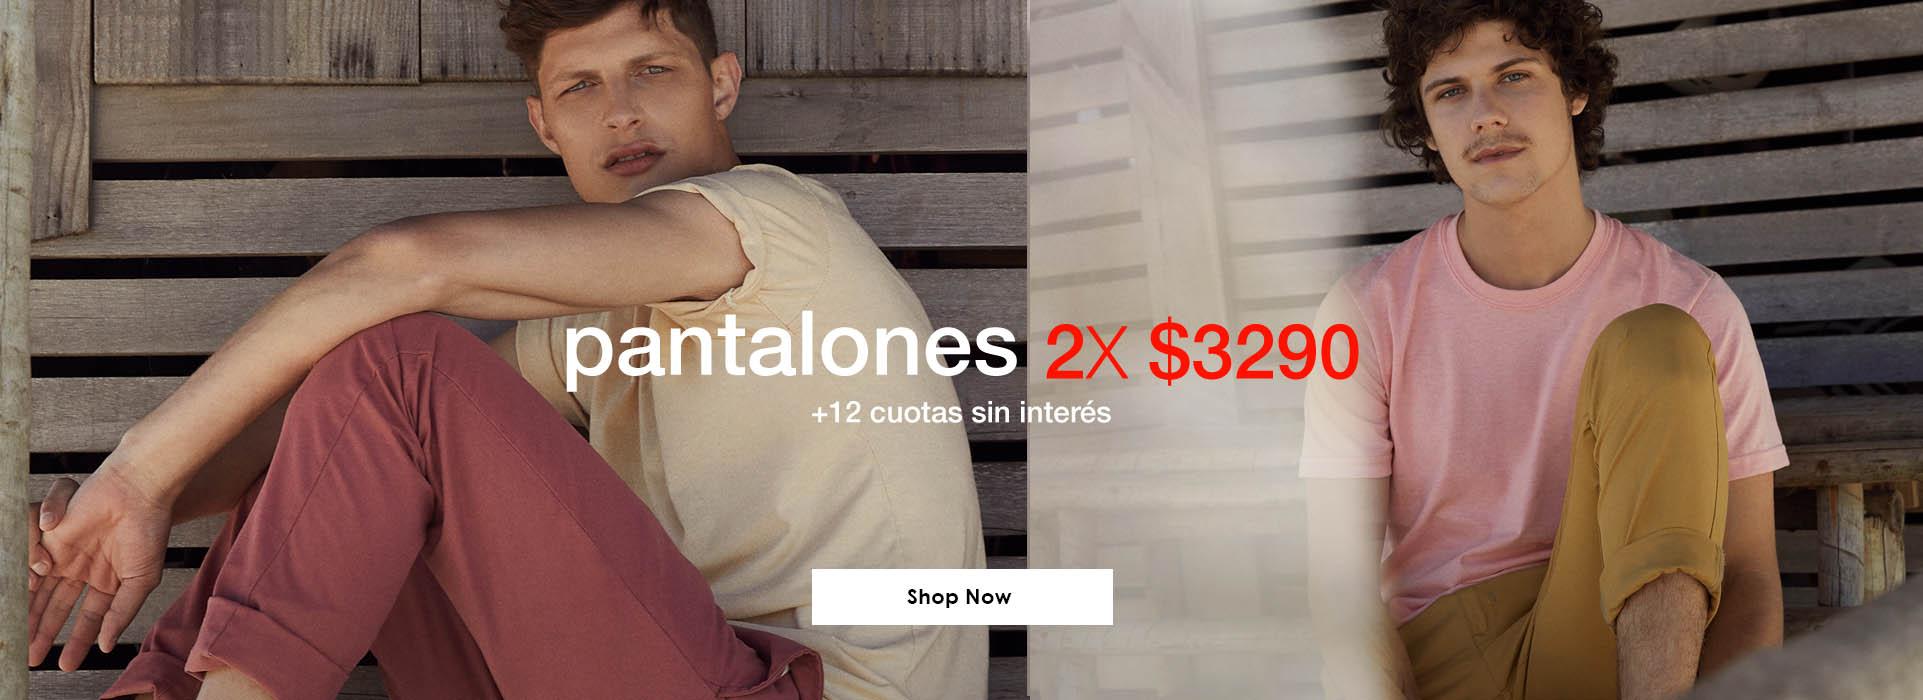 Promos- Pantalones 2x